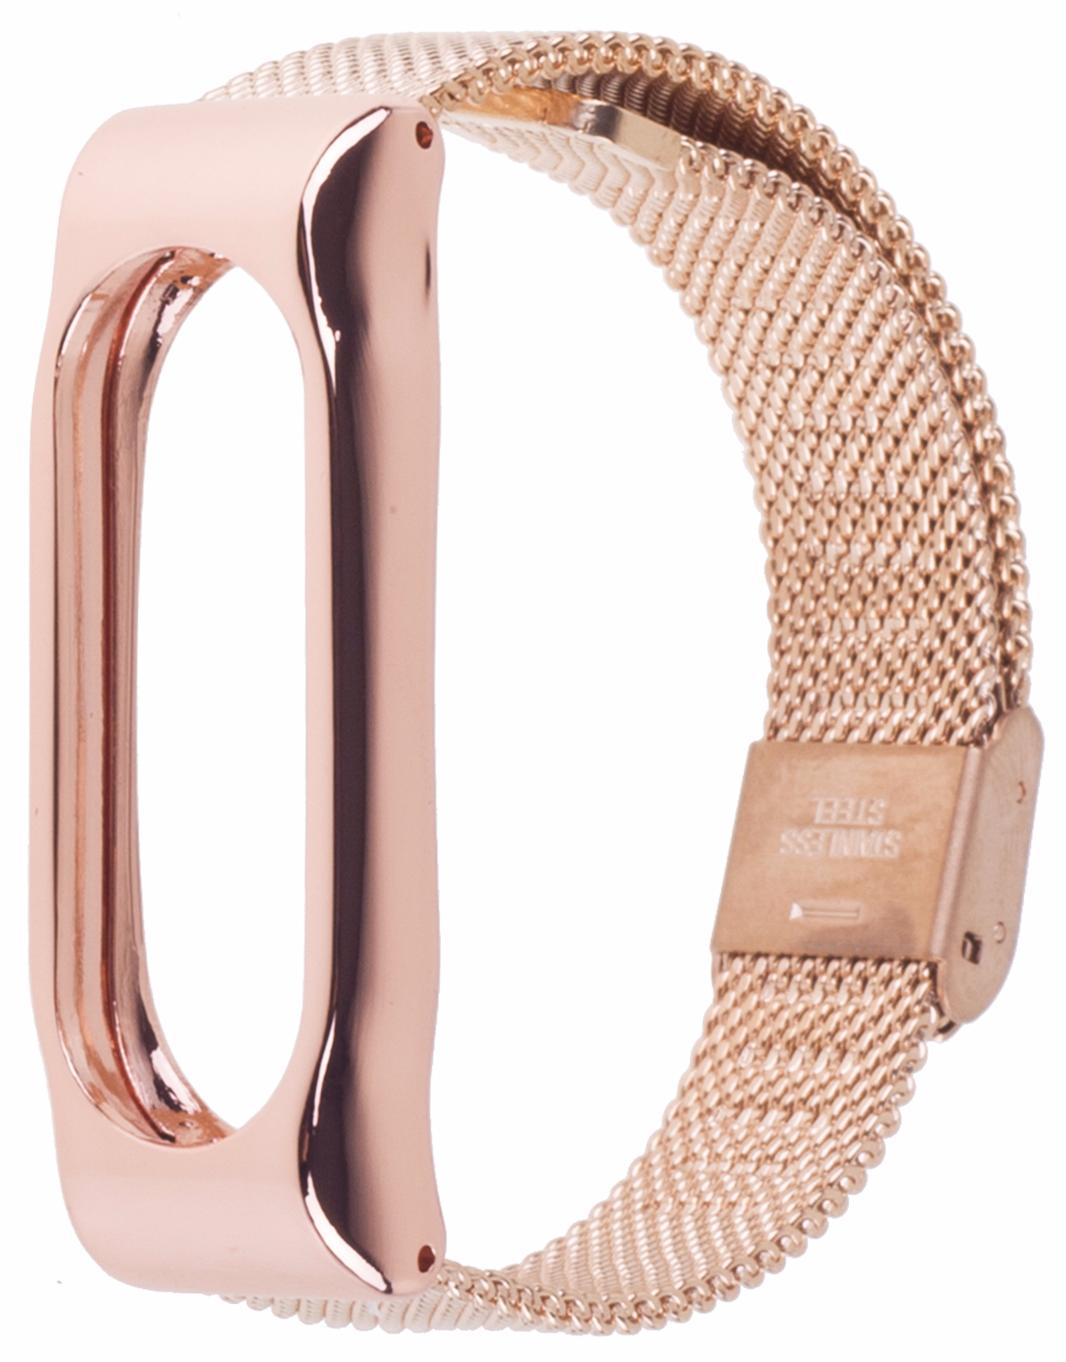 Xiaomi Milanese Metal Wristband - сменный ремешок для Xiaomi Mi Band 2 (Gold)